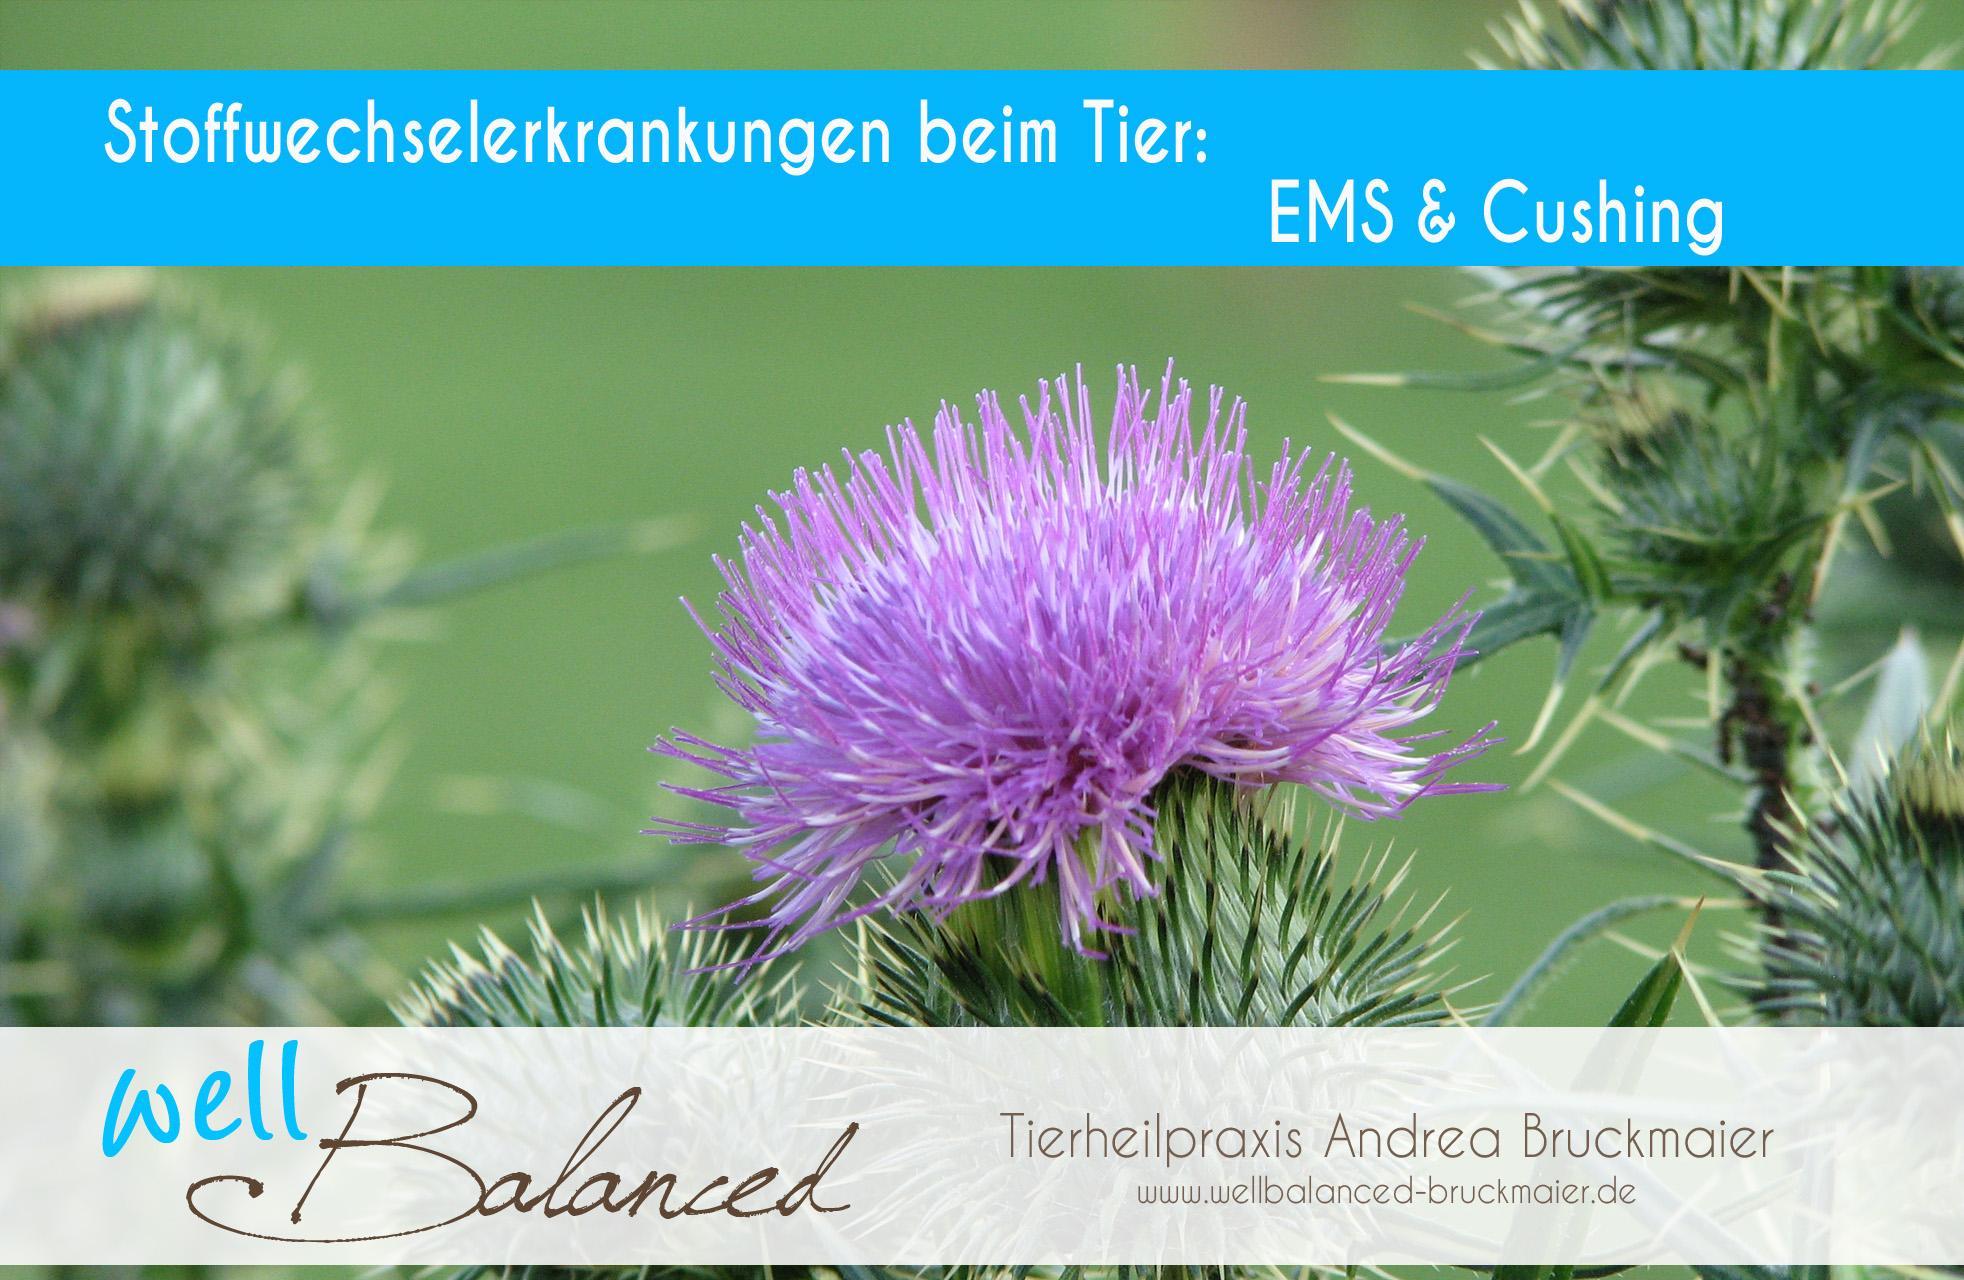 You are currently viewing Stoffwechselerkrankungen beim Tier: EMS & Cushing